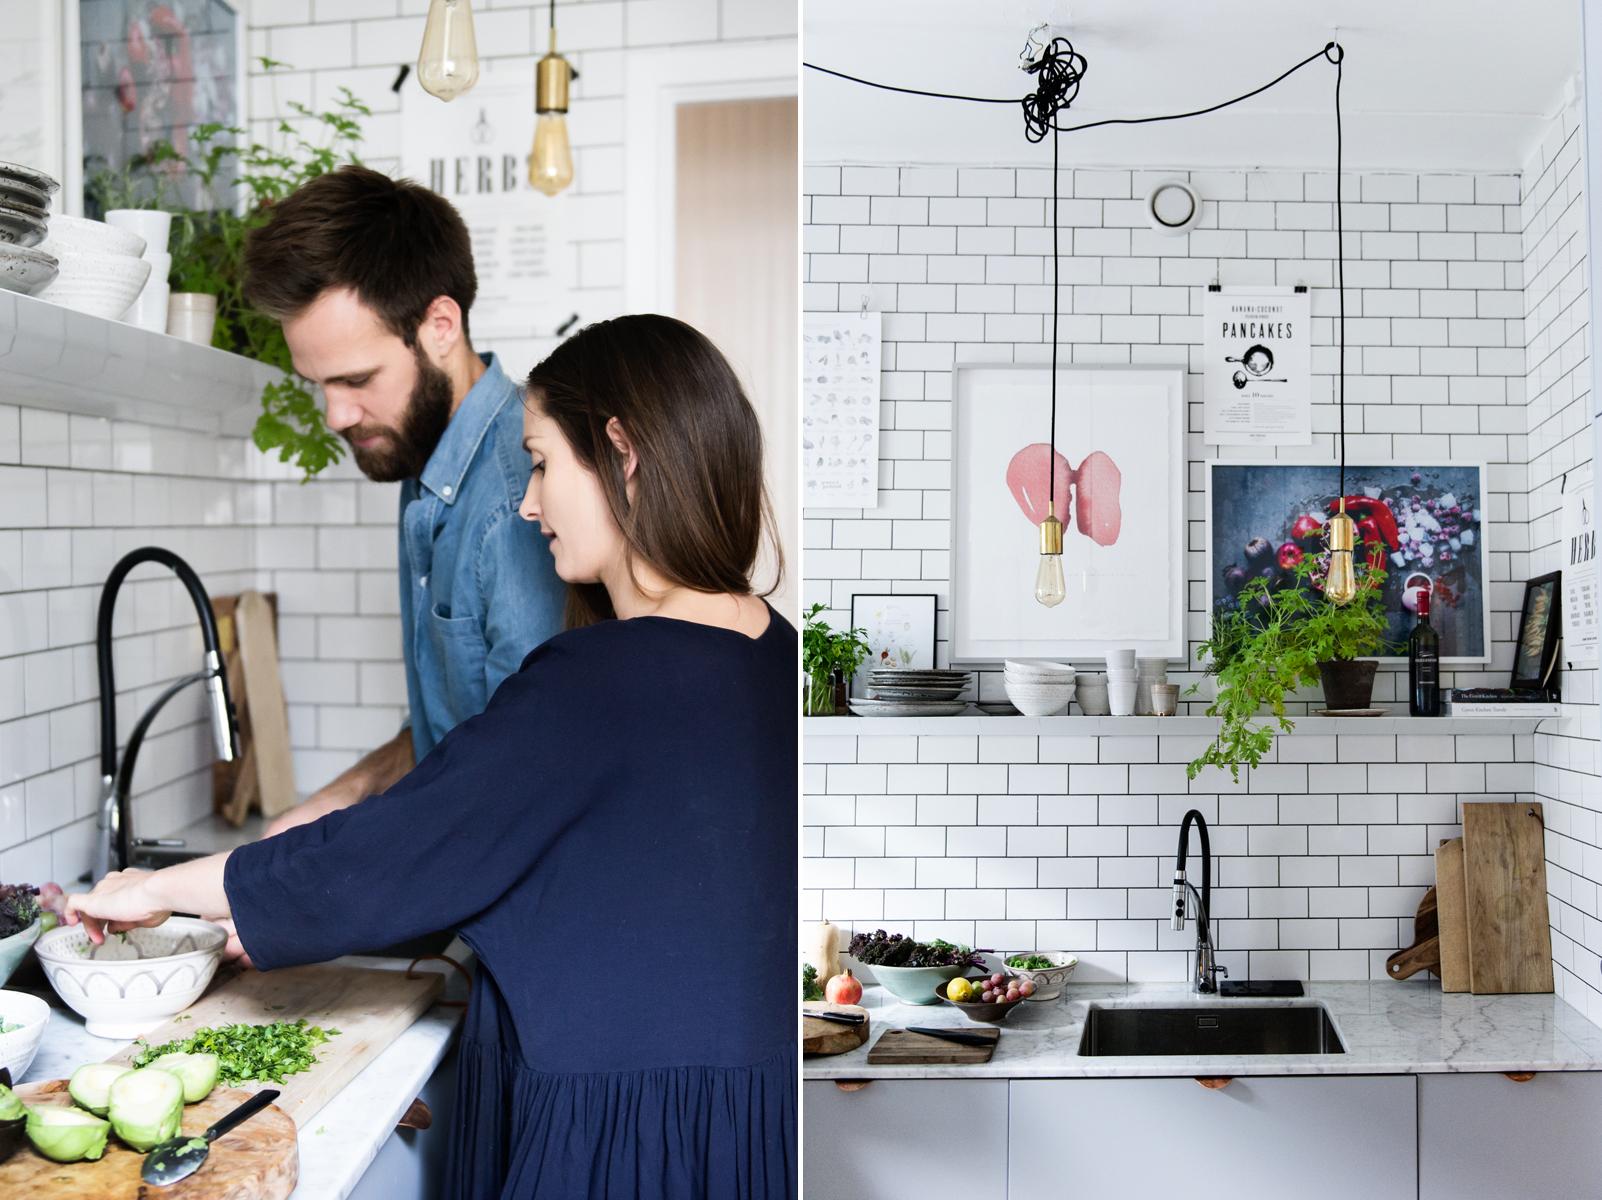 green kitchen stories food52 insta. Black Bedroom Furniture Sets. Home Design Ideas